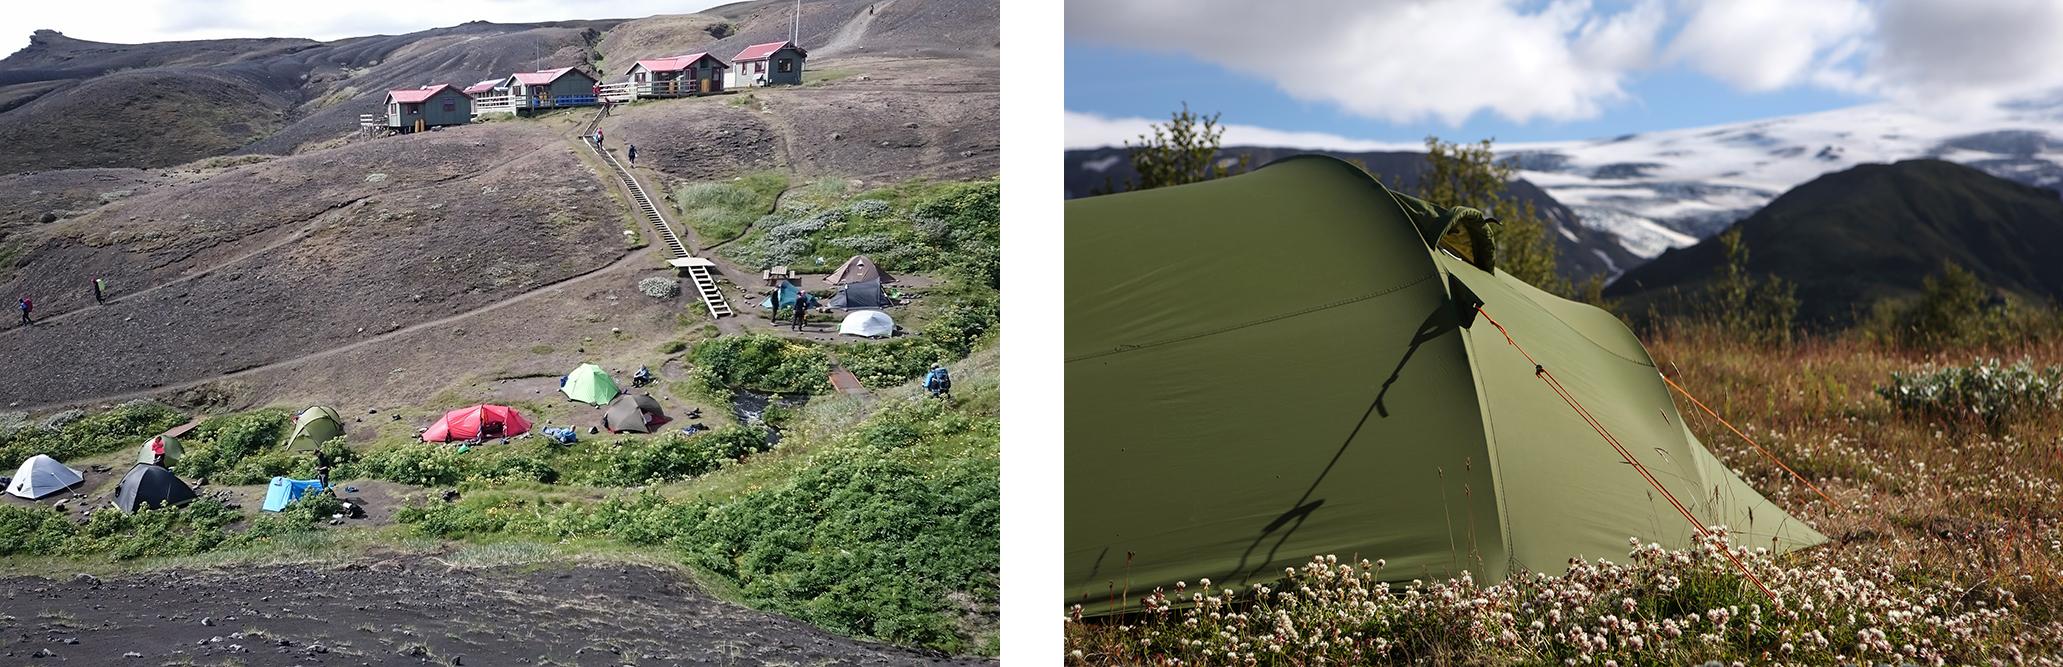 Campingtrek